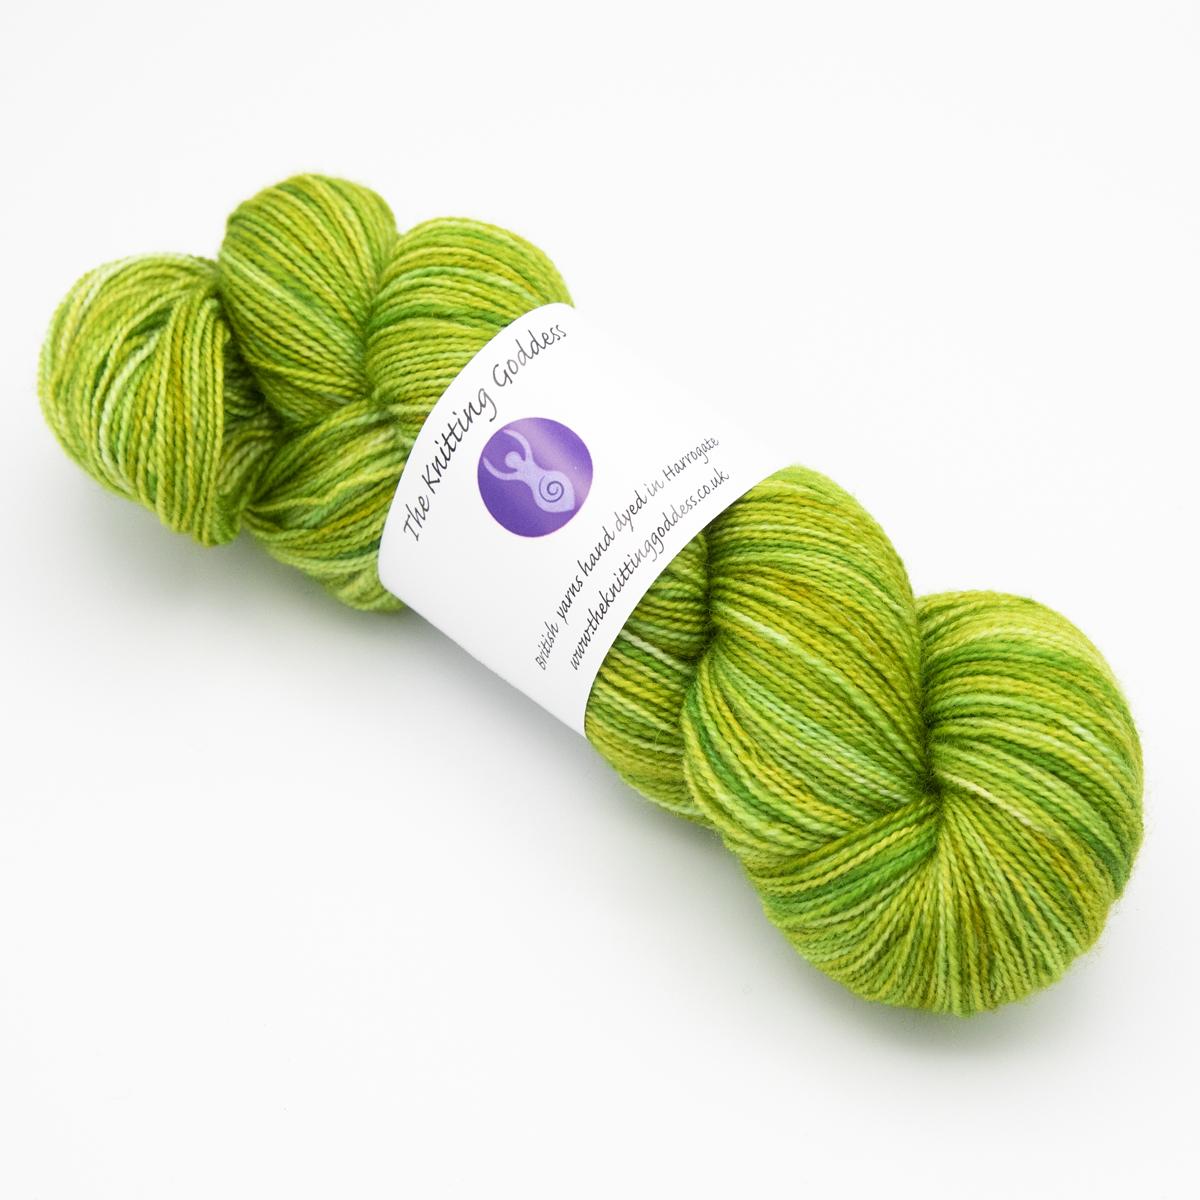 Lime colourway 4ply BFL nylon skein of yarn